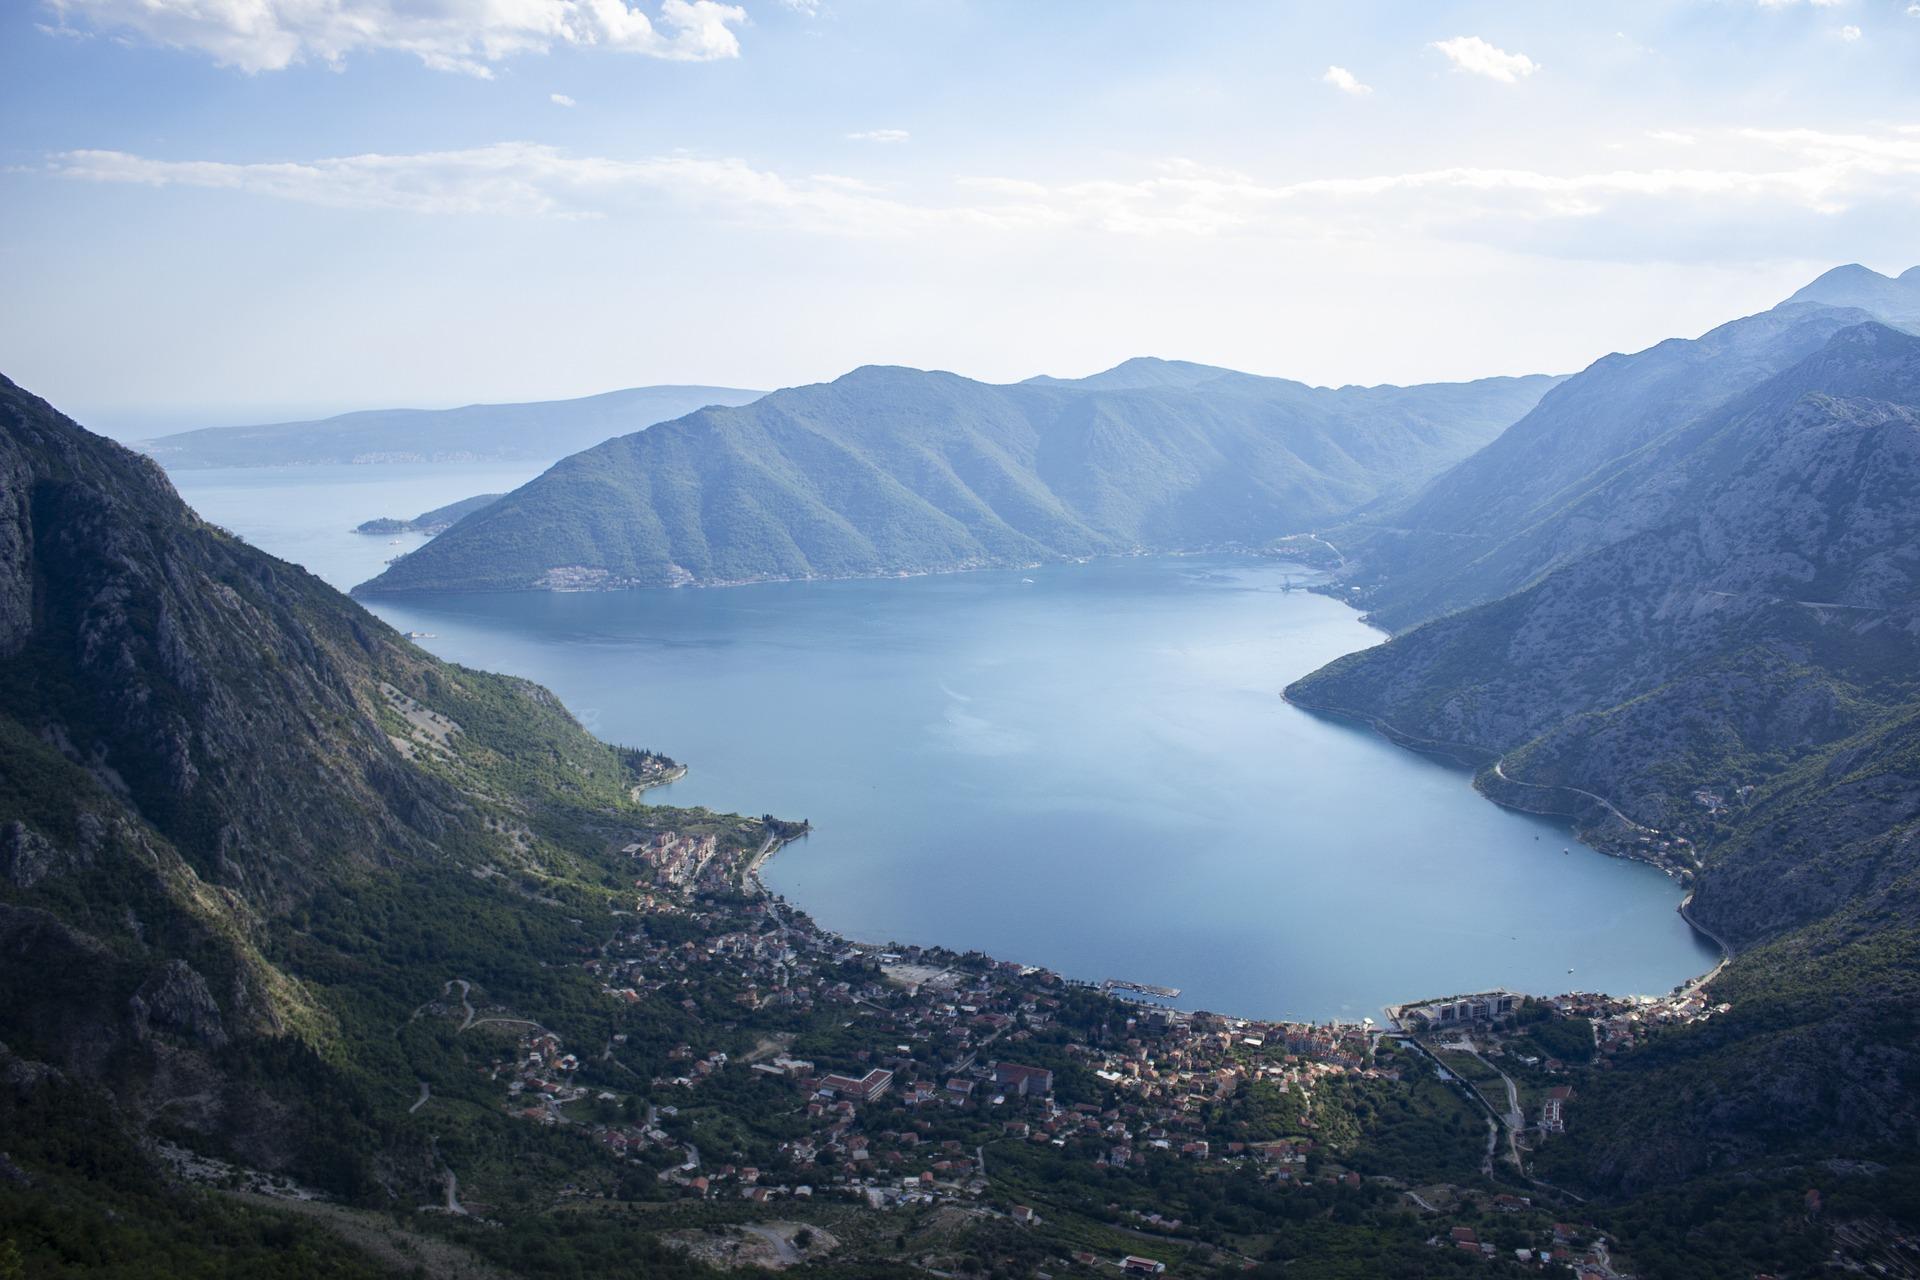 montenegro landscape-3864124_1920.jpg